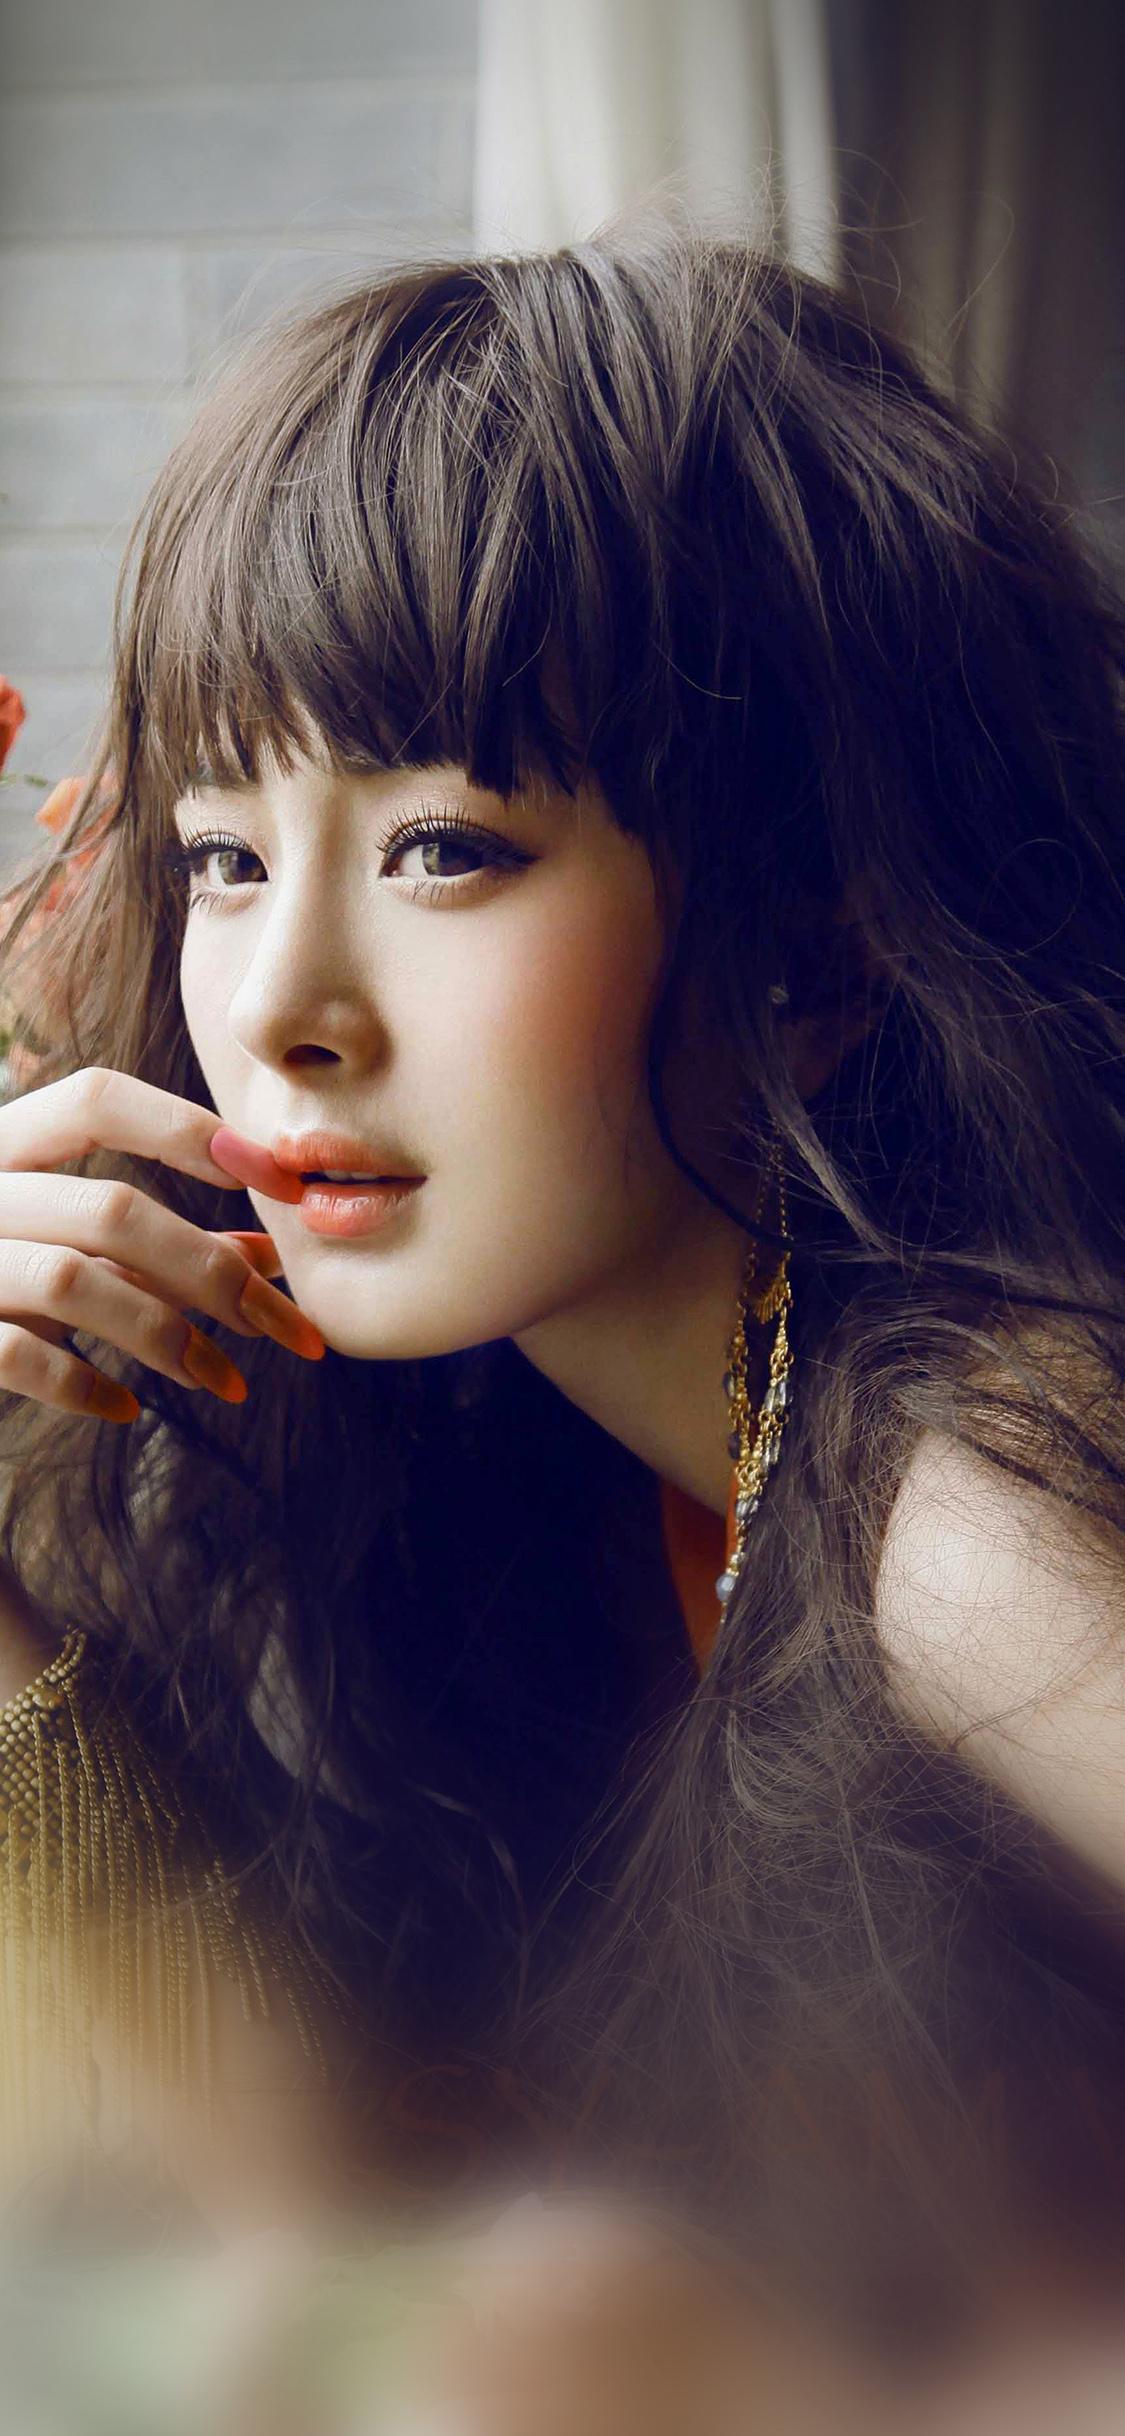 iPhoneXpapers.com-Apple-iPhone-wallpaper-hf83-yang-mi-actress-singer-beauty-sexy